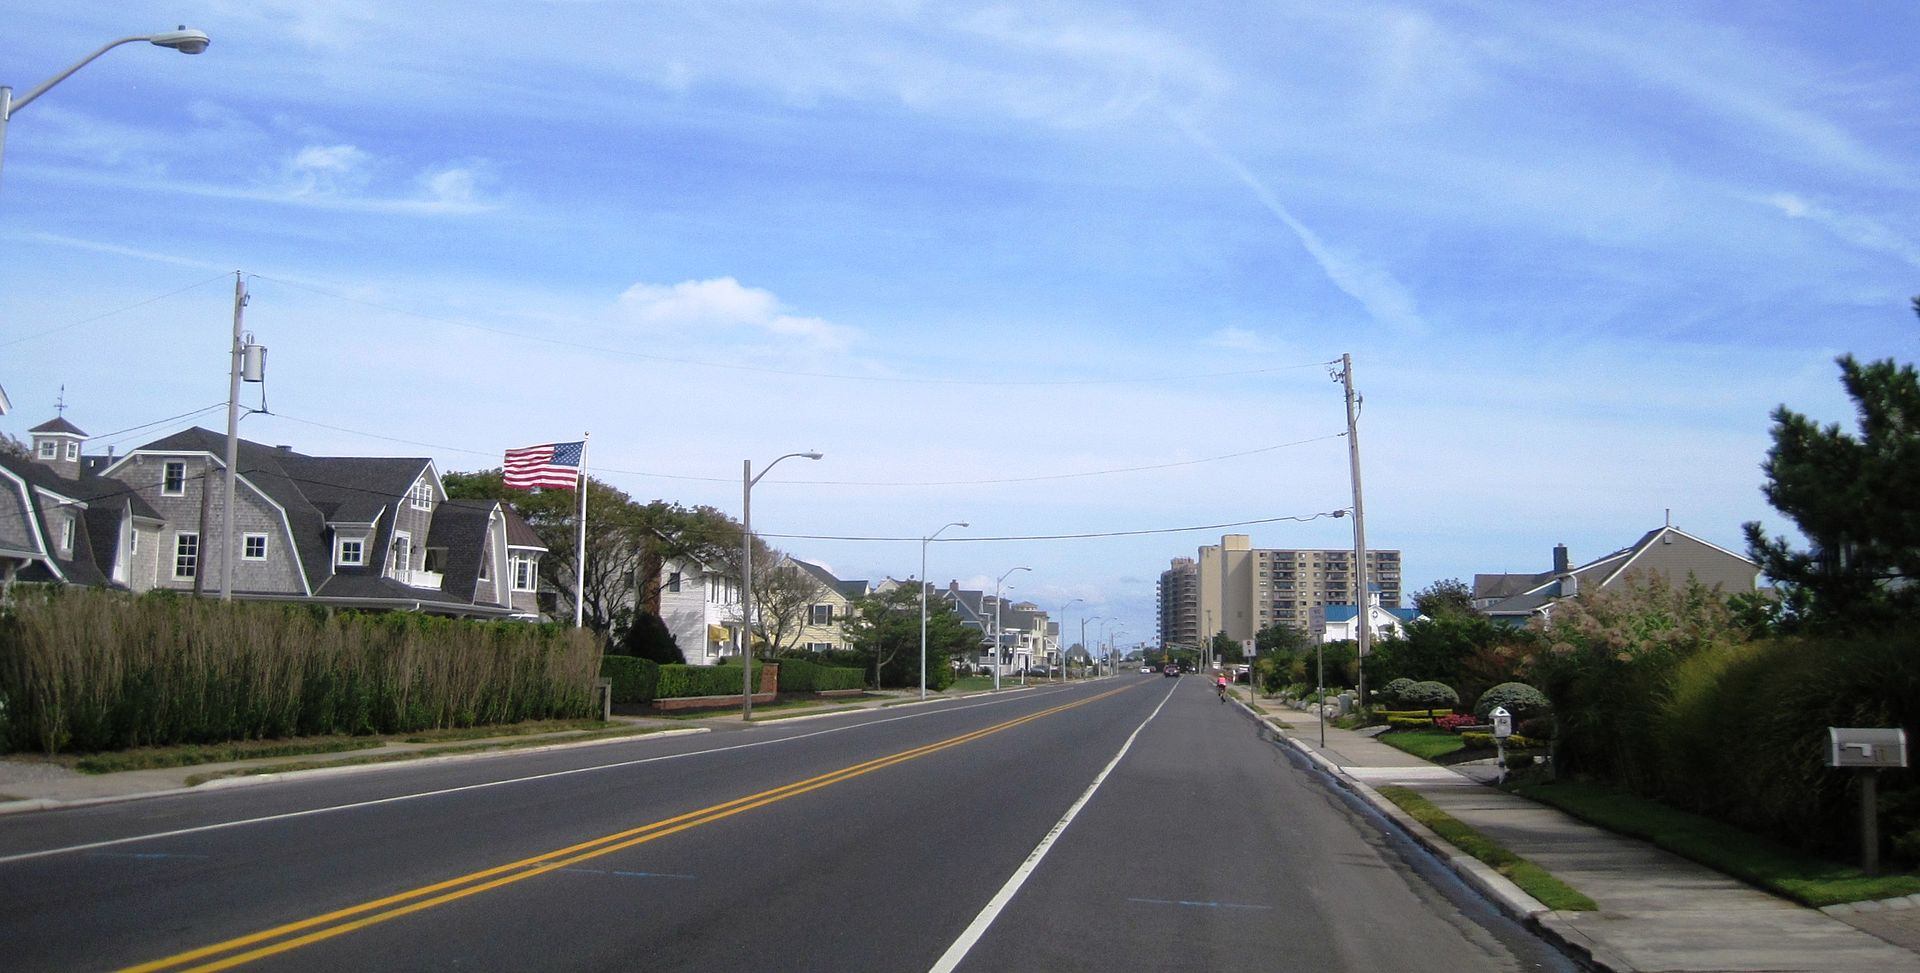 Monmouth Beach, New Jersey